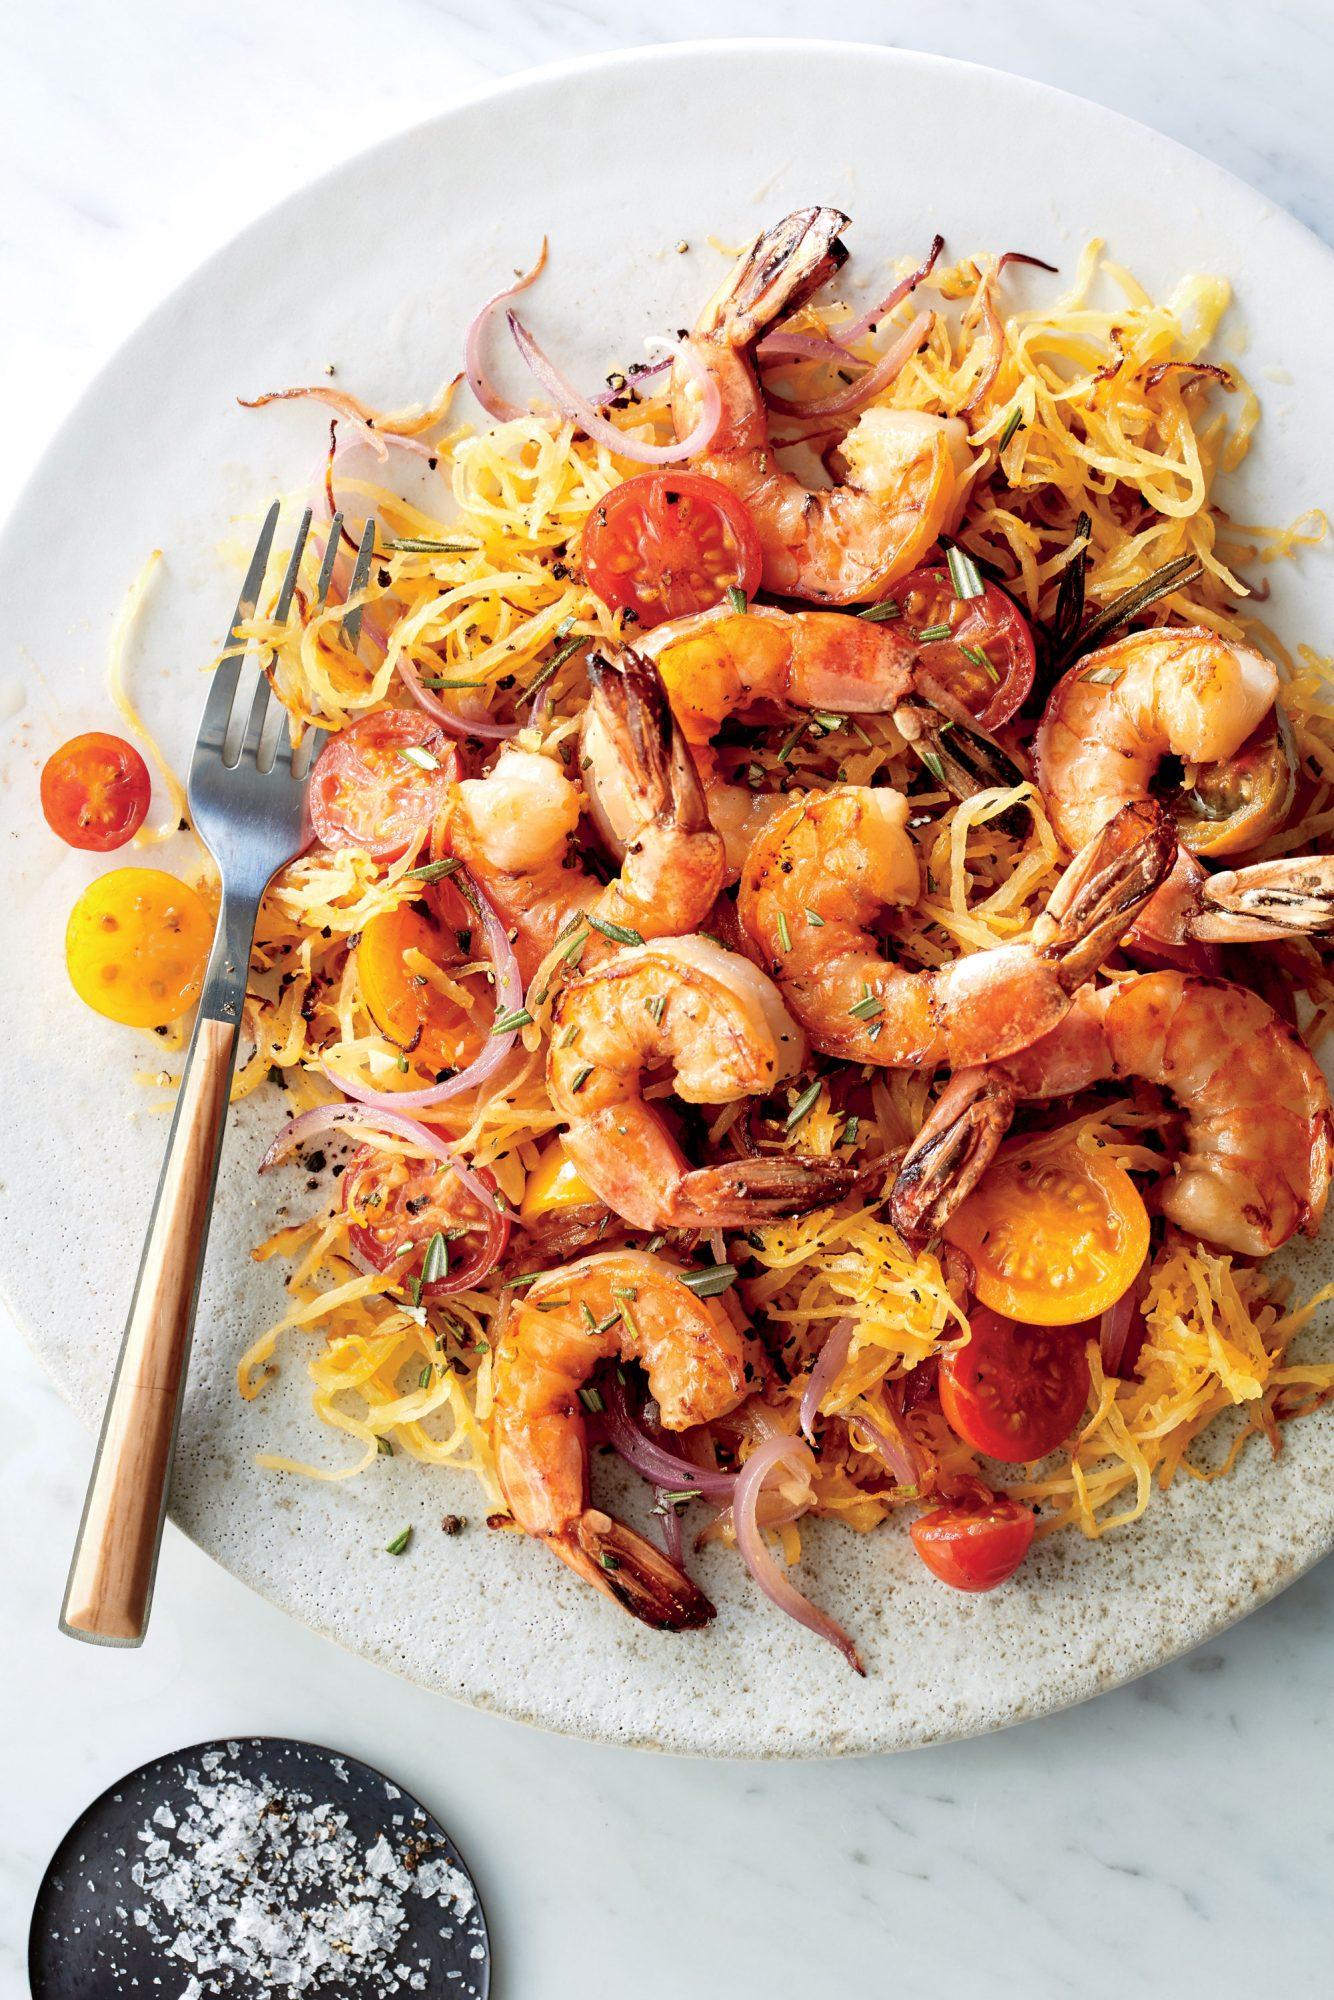 Pan Seared Shrimp with Rosemary Spaghetti Squash image